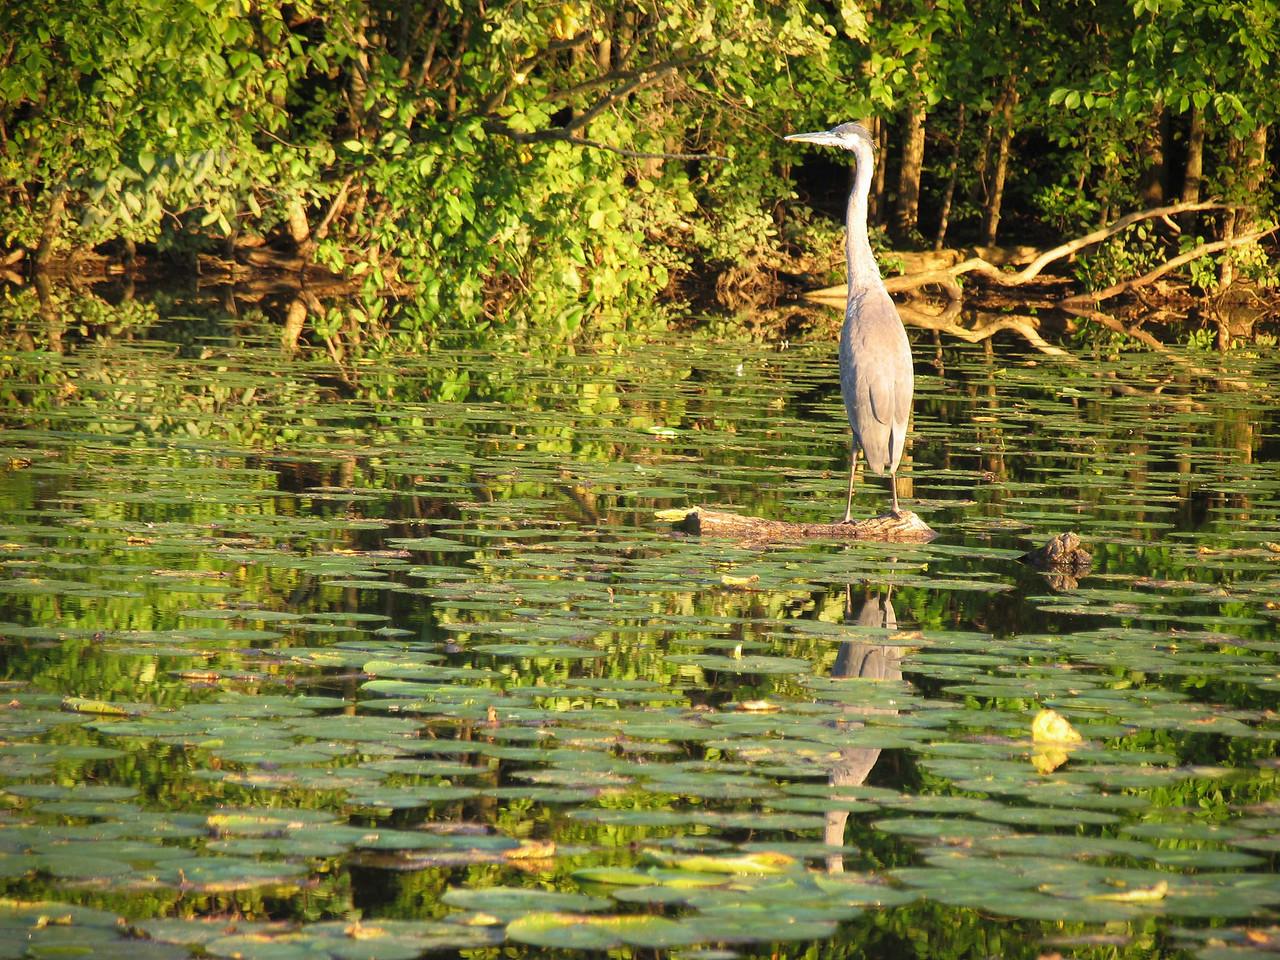 Blue Heron, Lake Nockamixon - August 2004